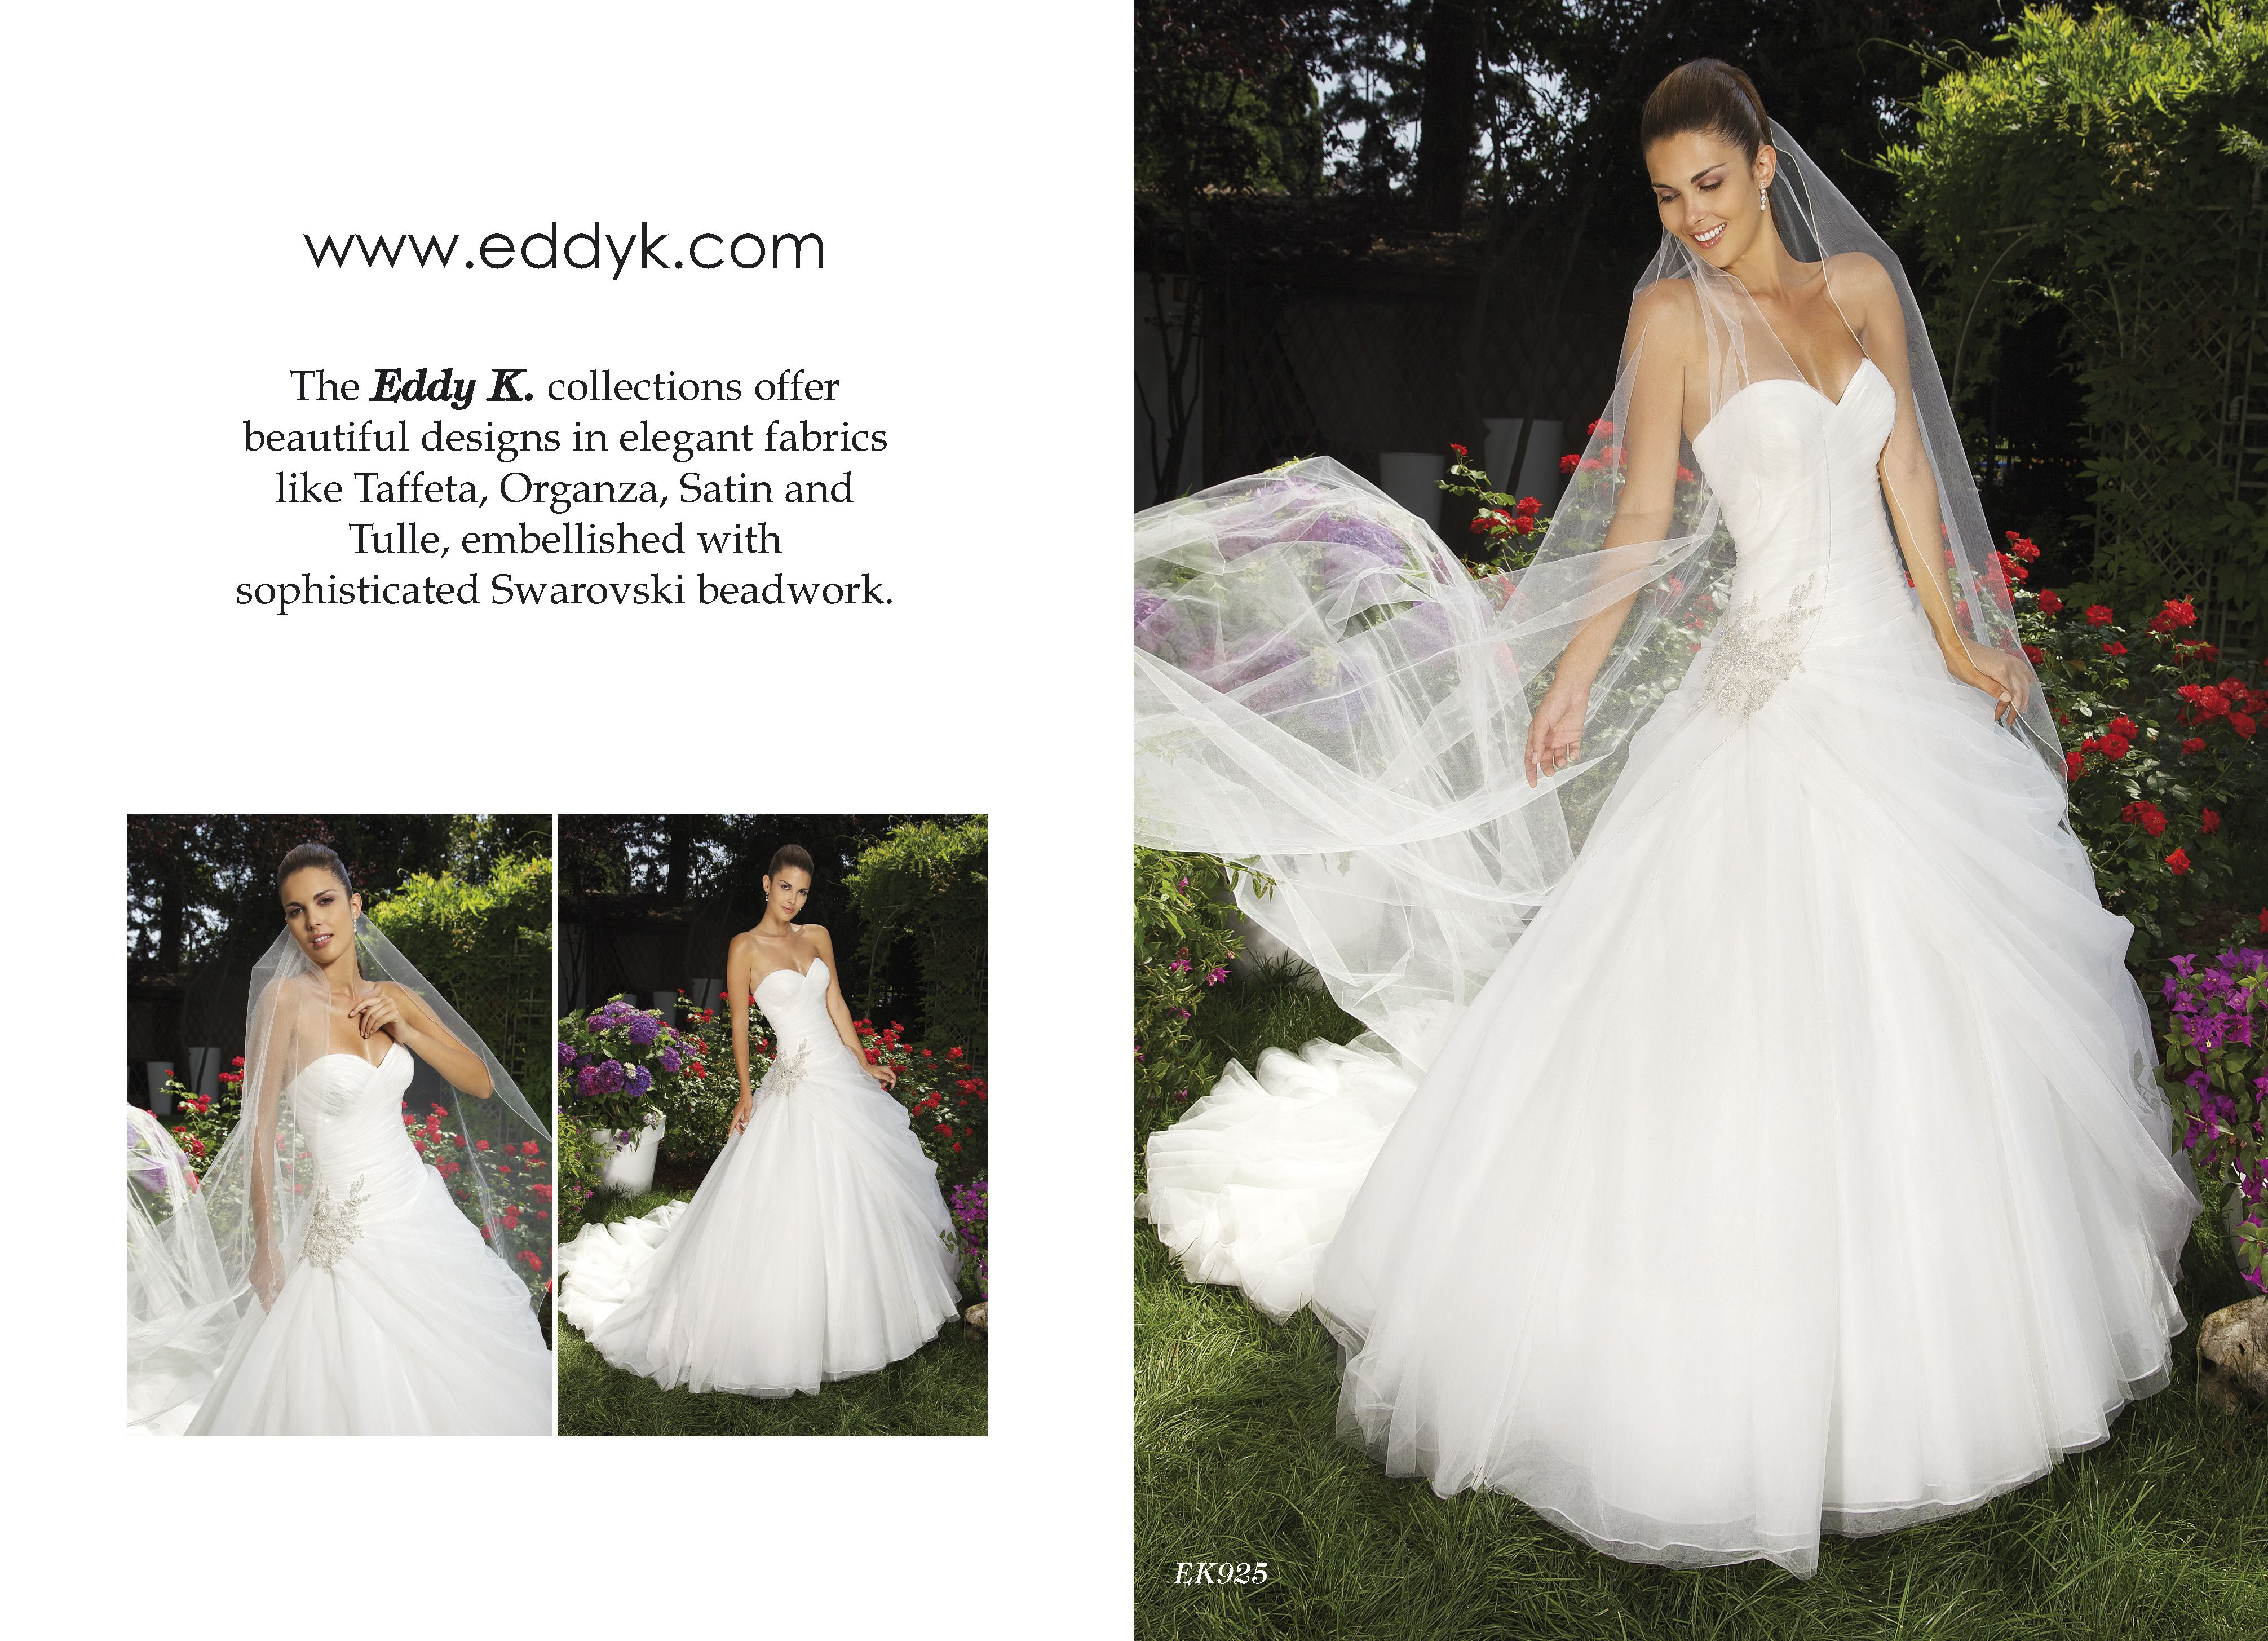 Princess Ball Gown Wedding Dress: Here's A Very Pretty Princess Style Wedding Dress By Eddy